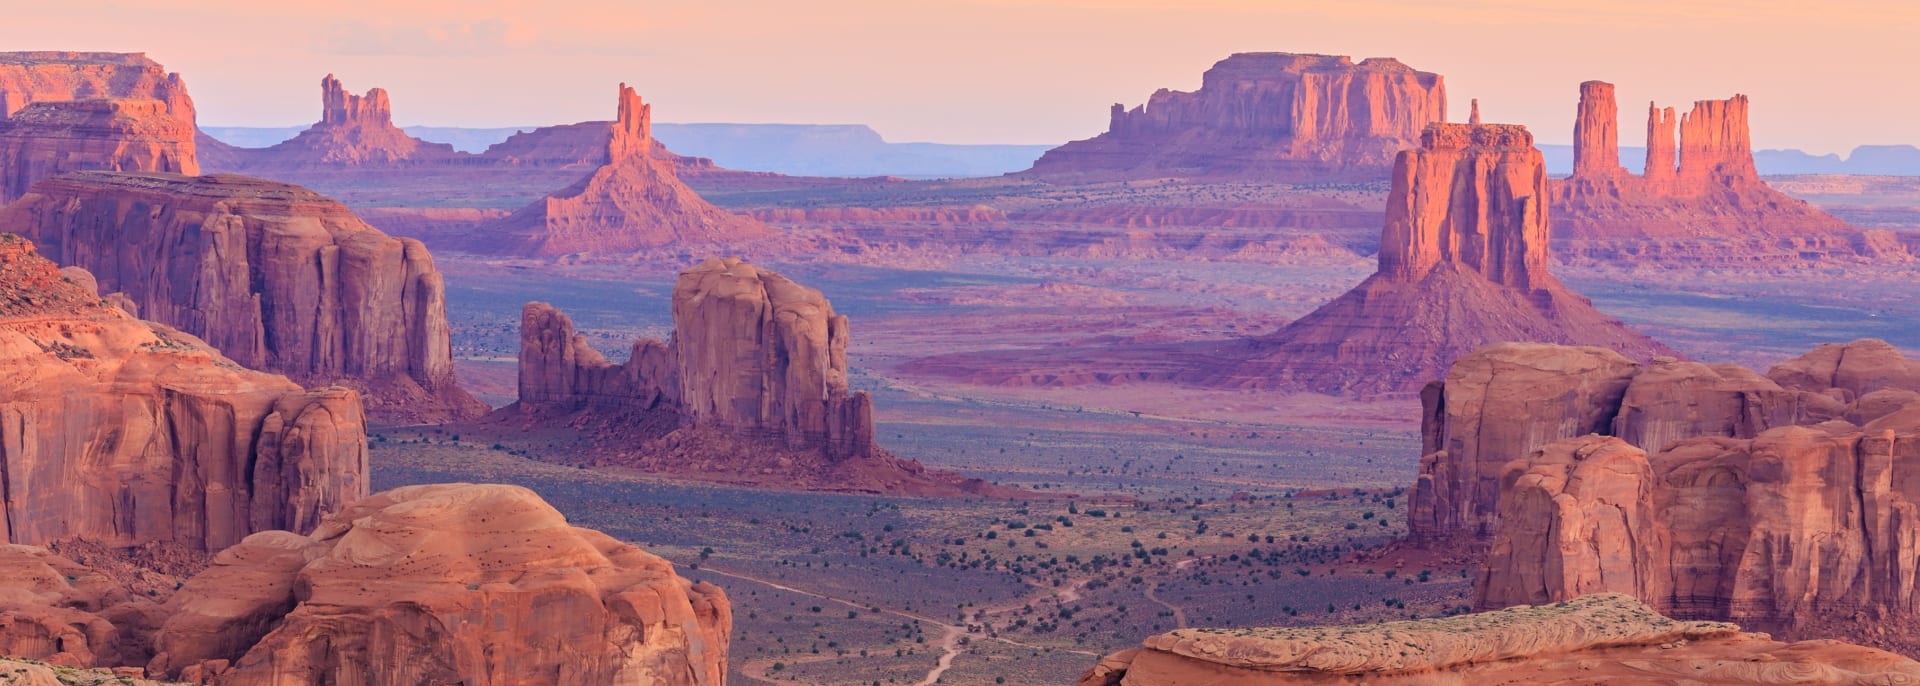 Monument Valley Nationalpark, USA